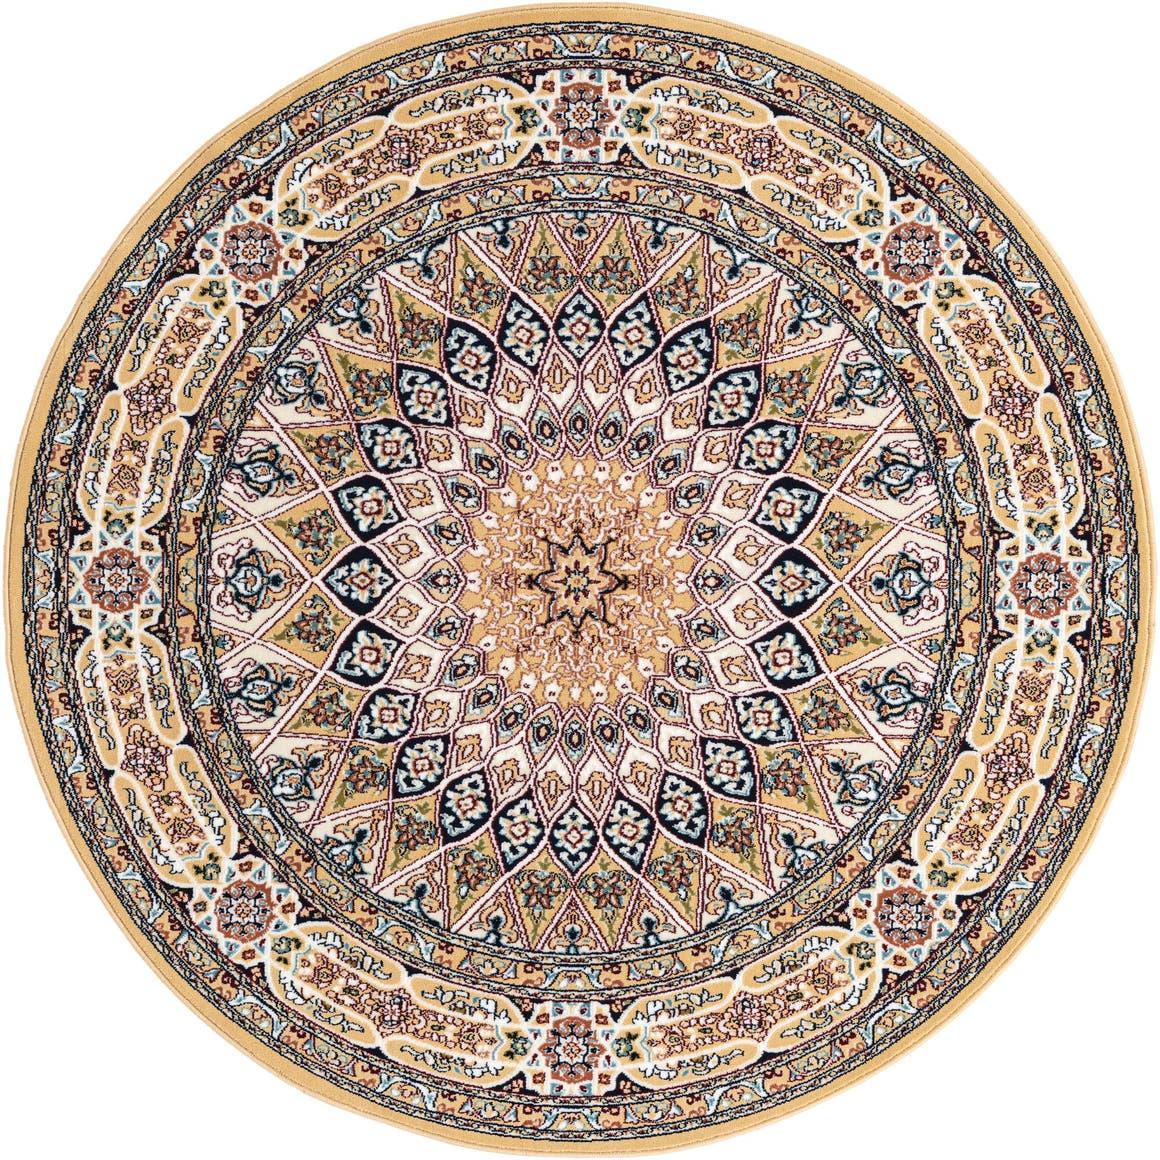 5' x 5' Nain Design Round Rug main image